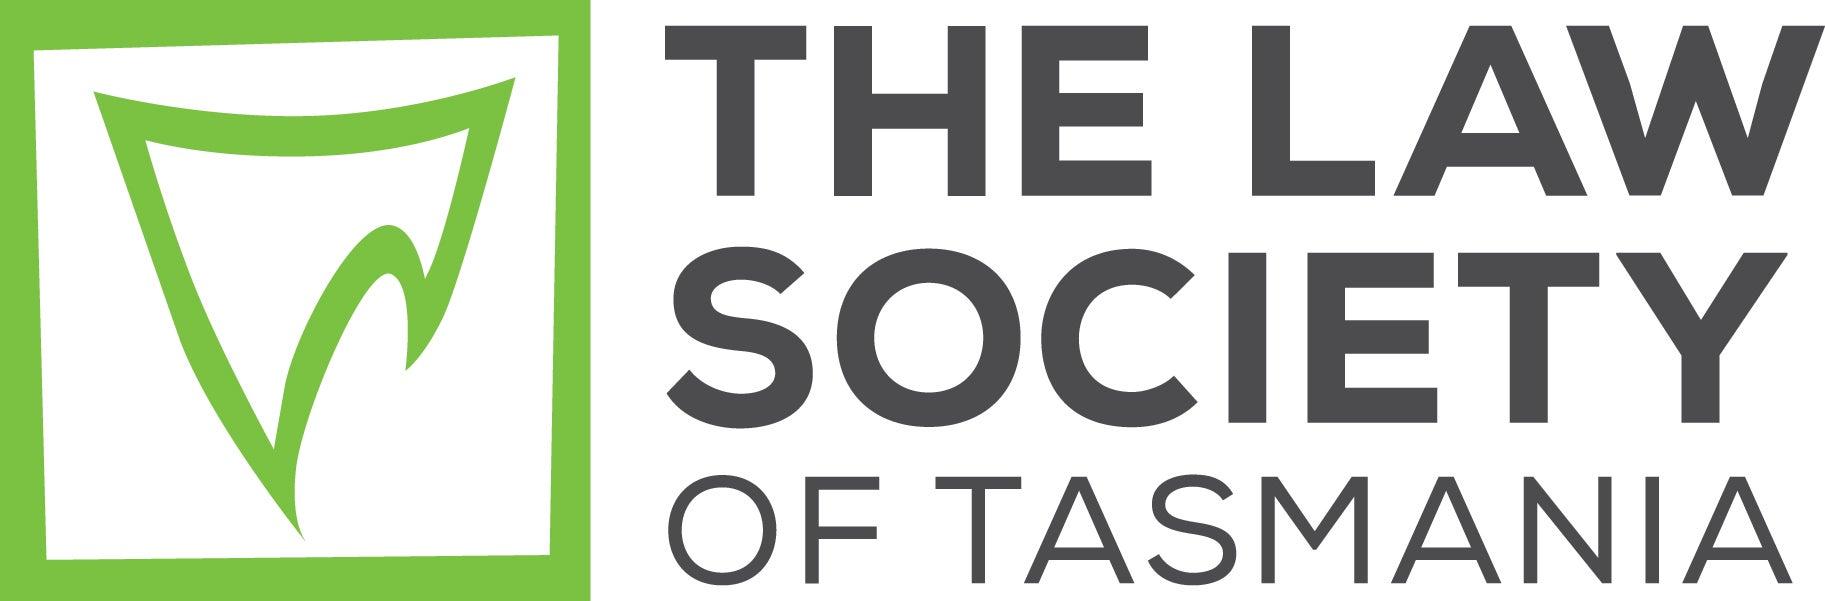 The Law Society of Tasmania